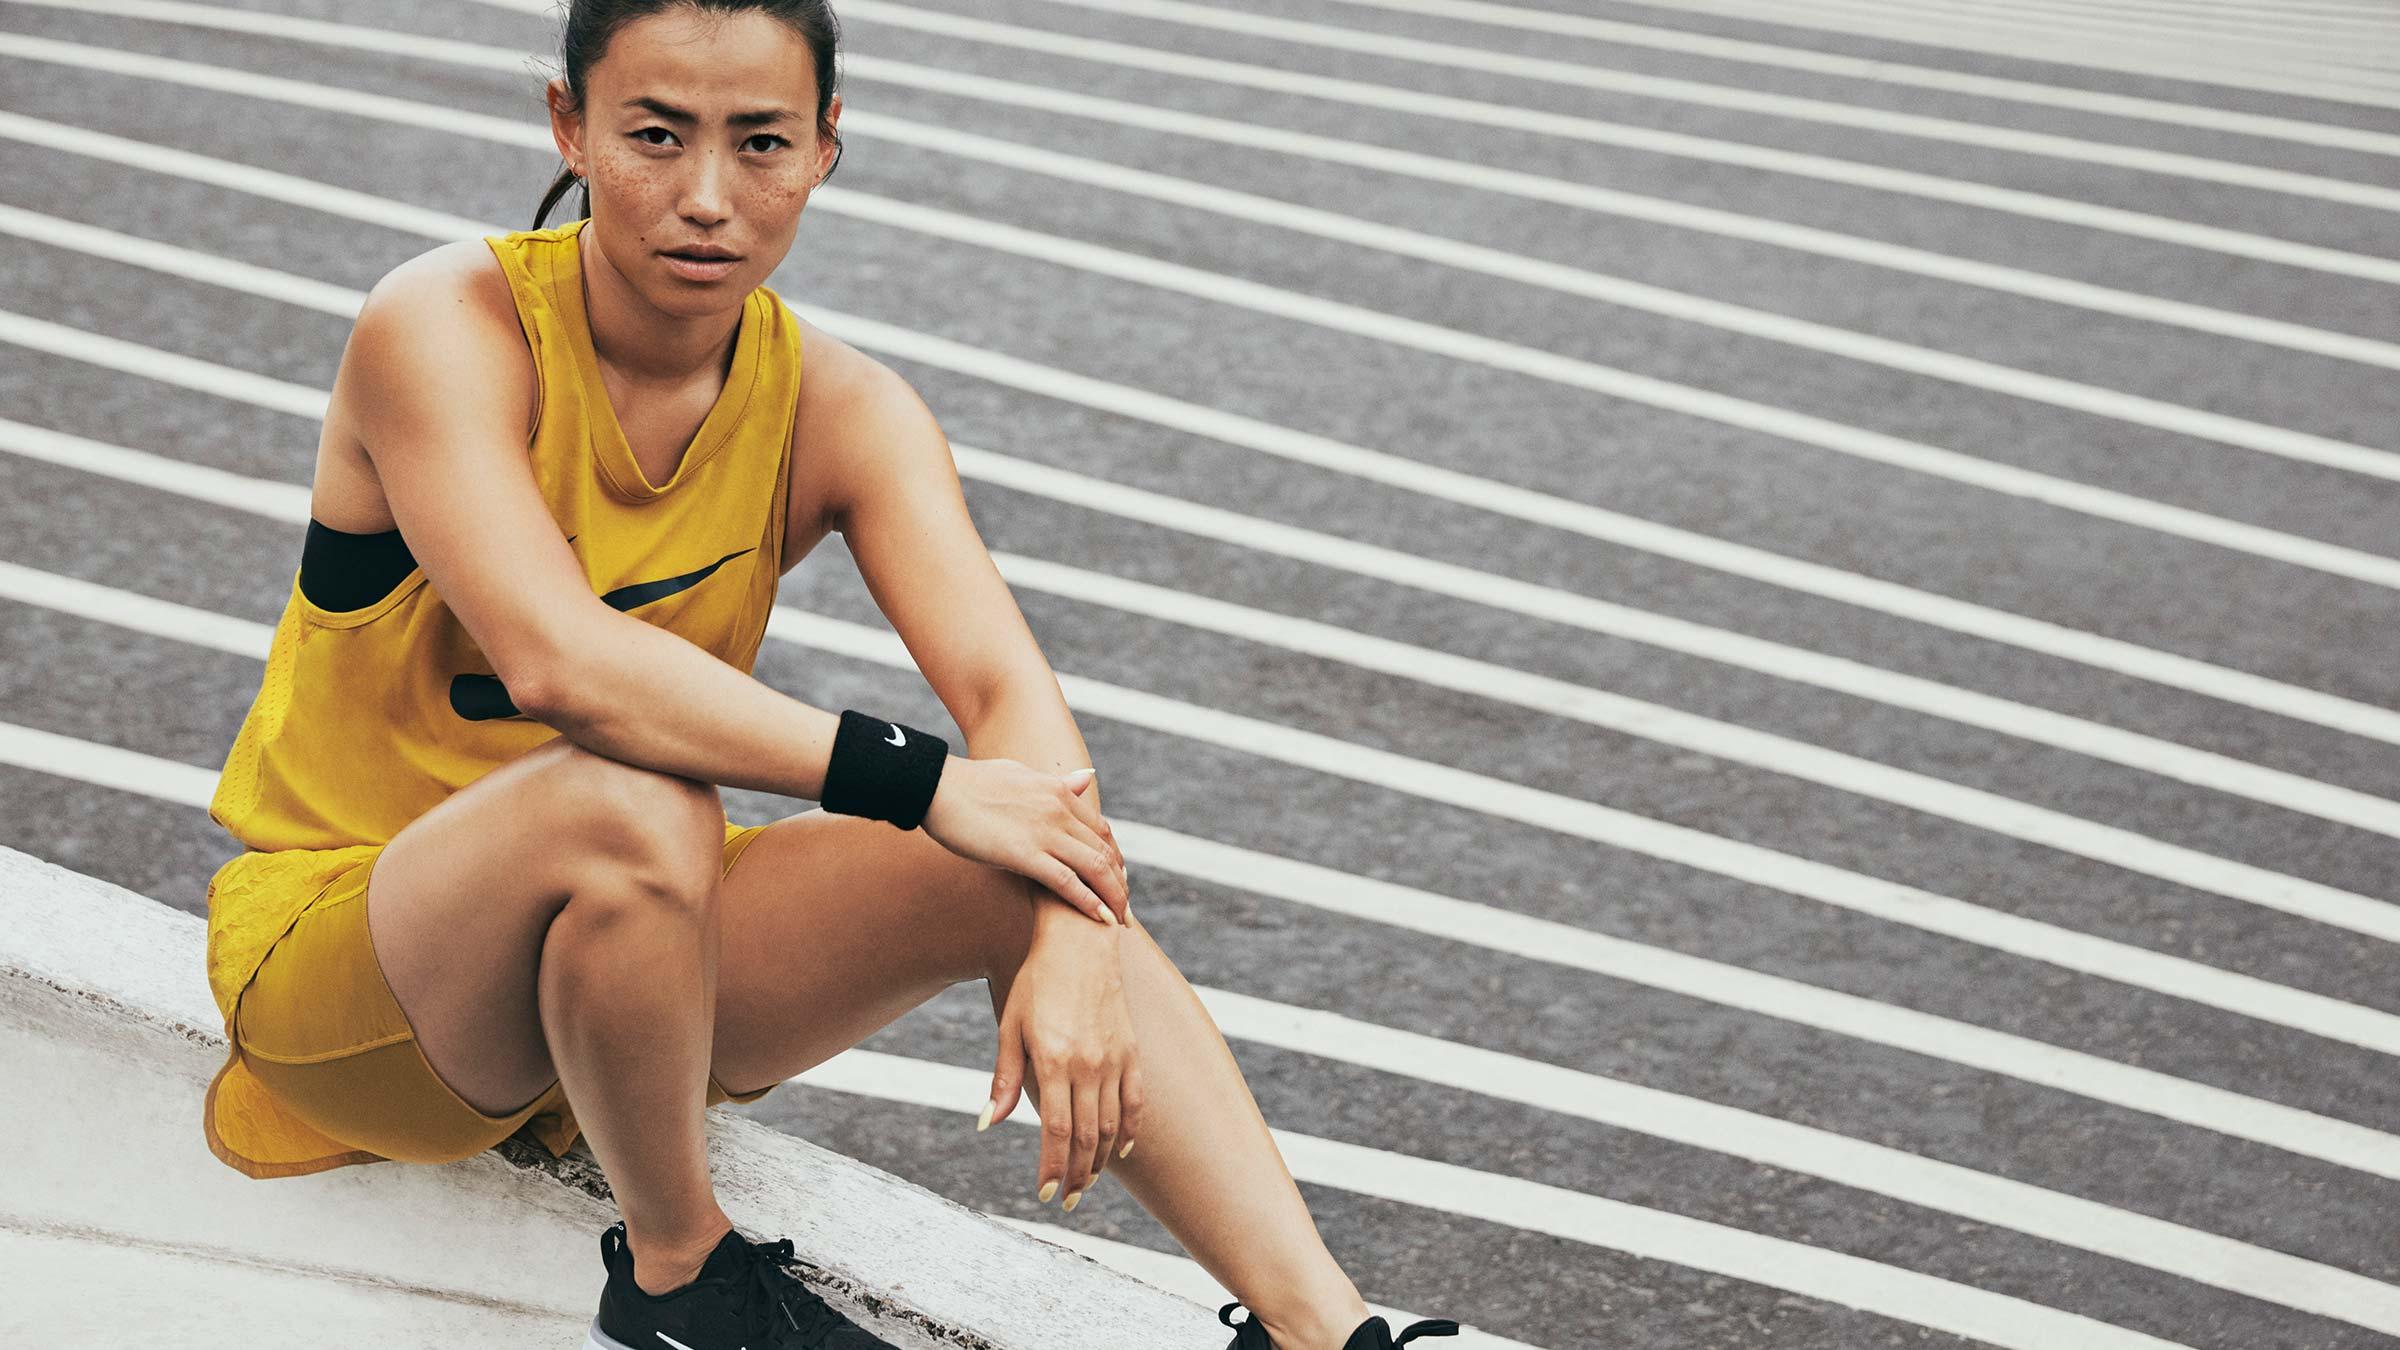 CPH_Marathon_Women_Header_Outfit_2_2400x1350